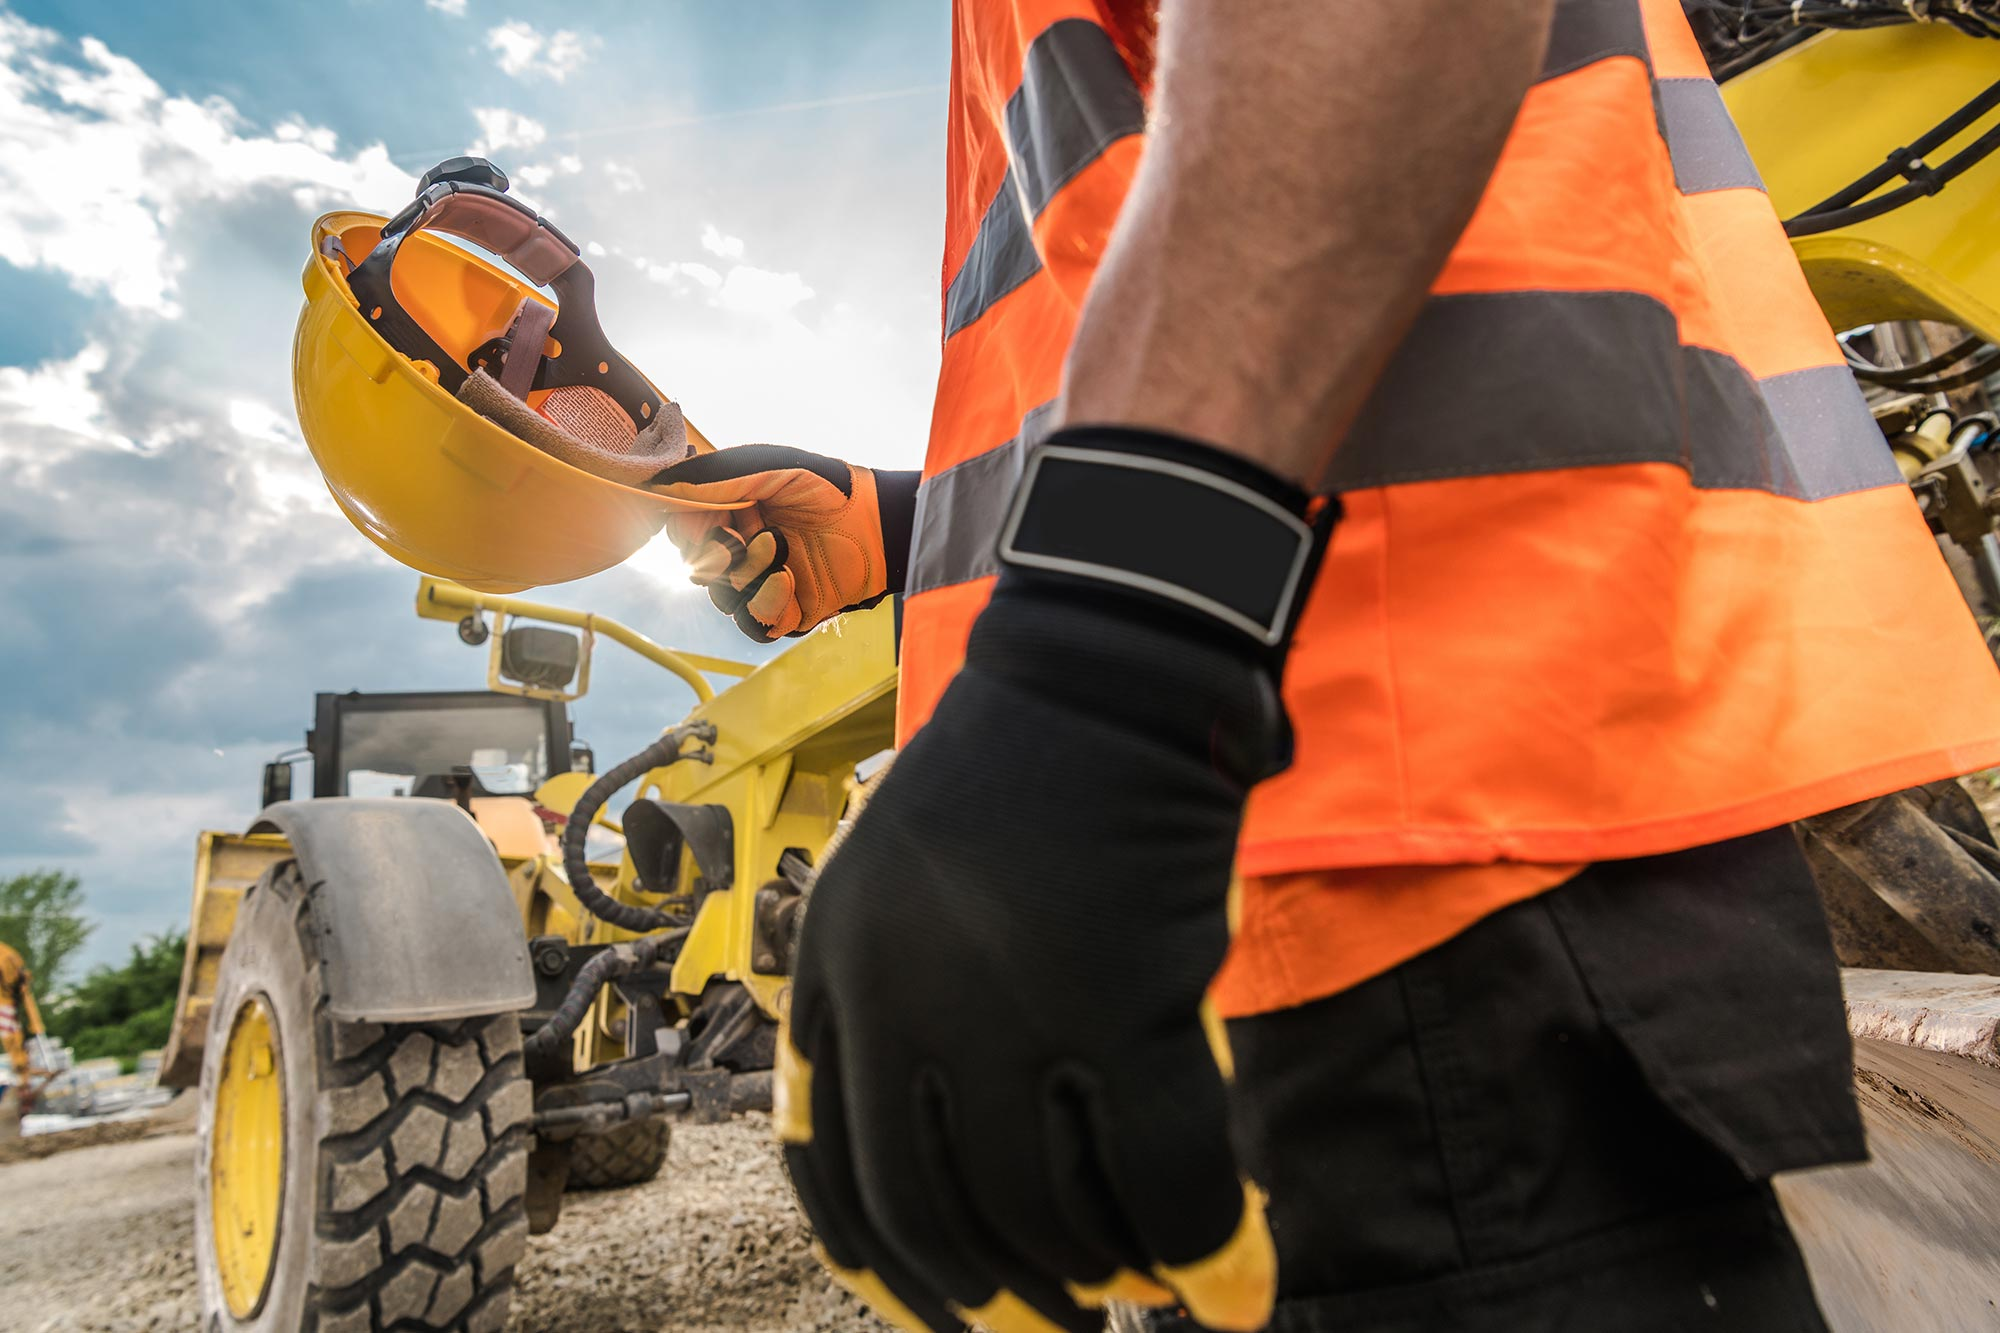 worker with hard hat, hi-vis vest directing equipment